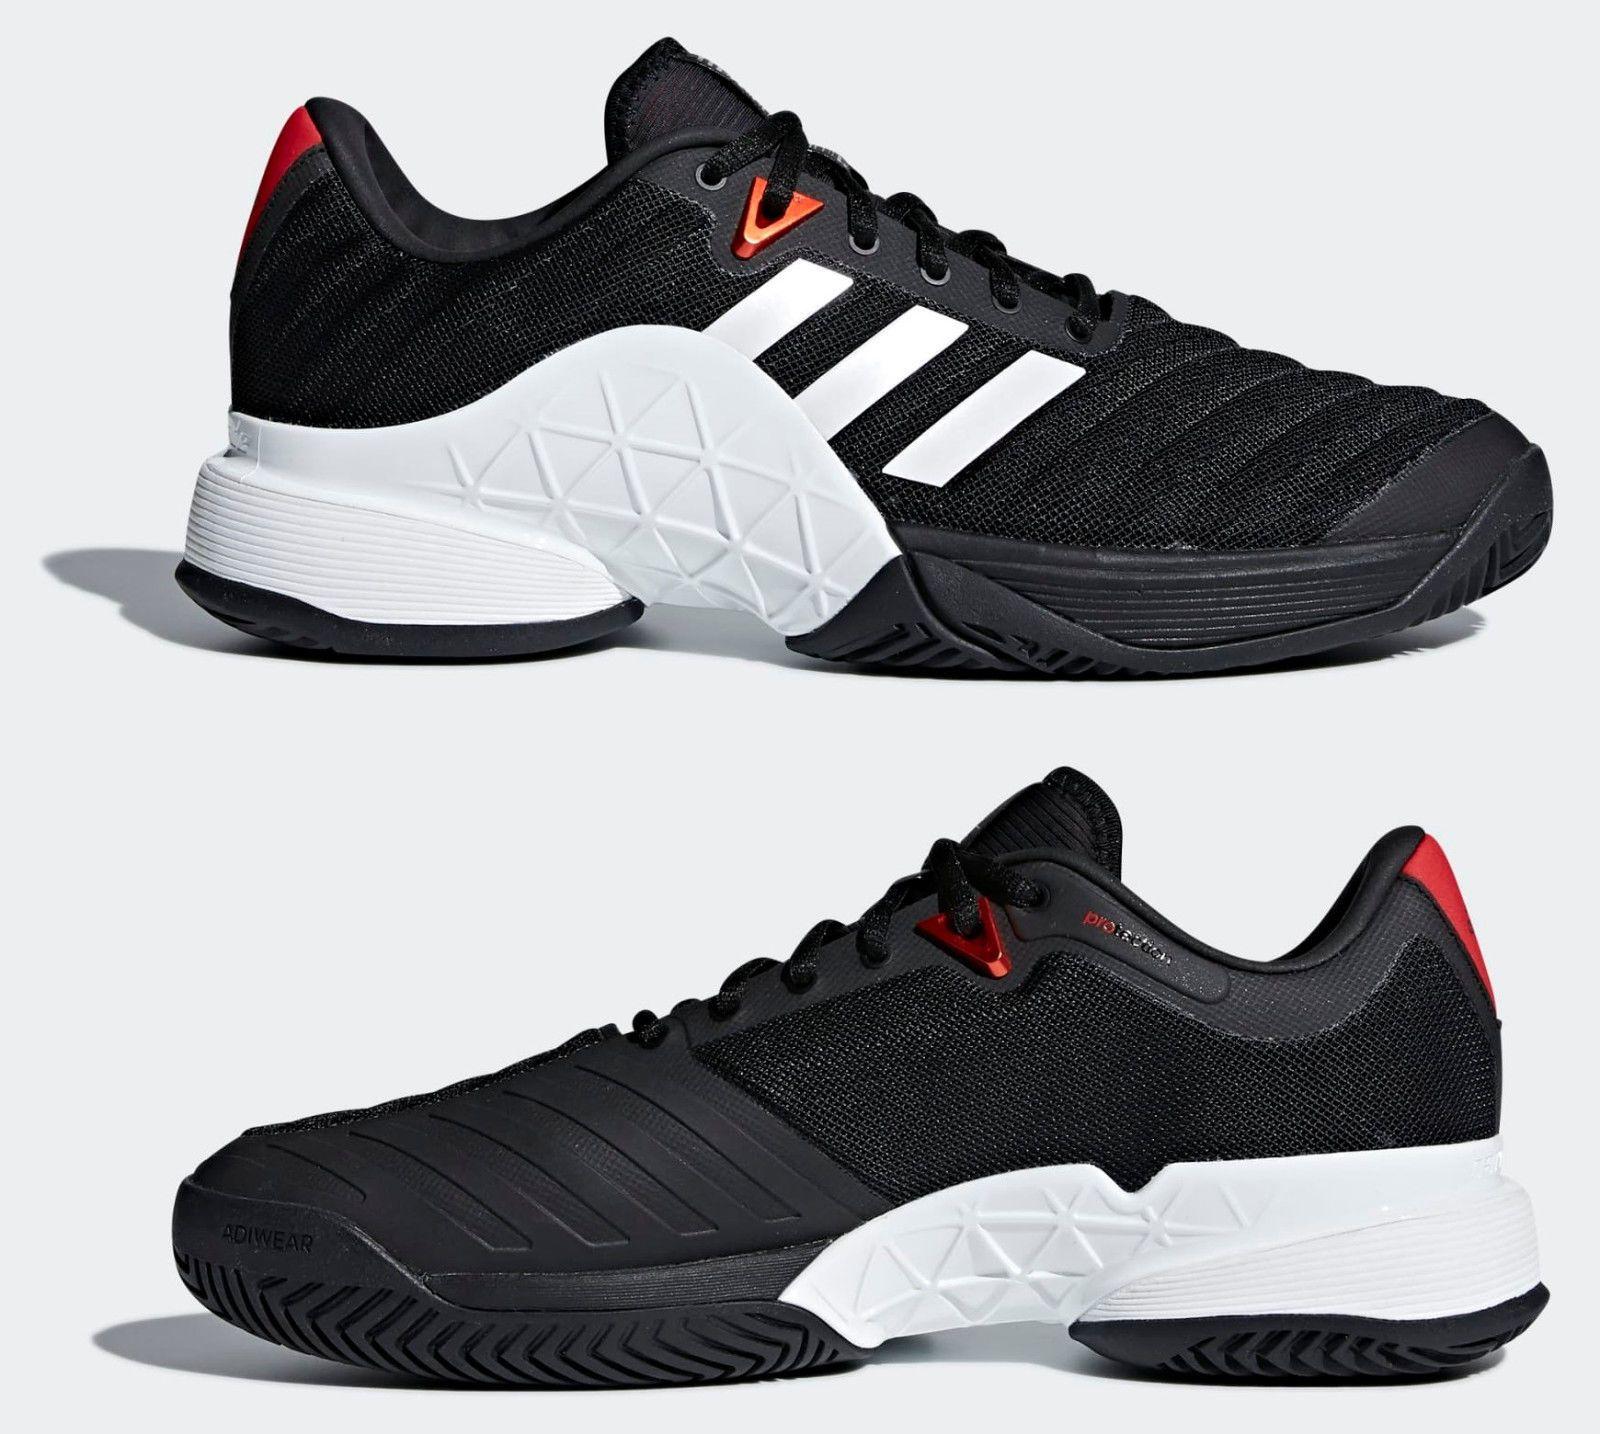 newest 47eb3 66bc5 BRAND NEW ADIDAS Barricade 2018 Men s 12 Tennis Shoes CM7818 Black White  Scarlet